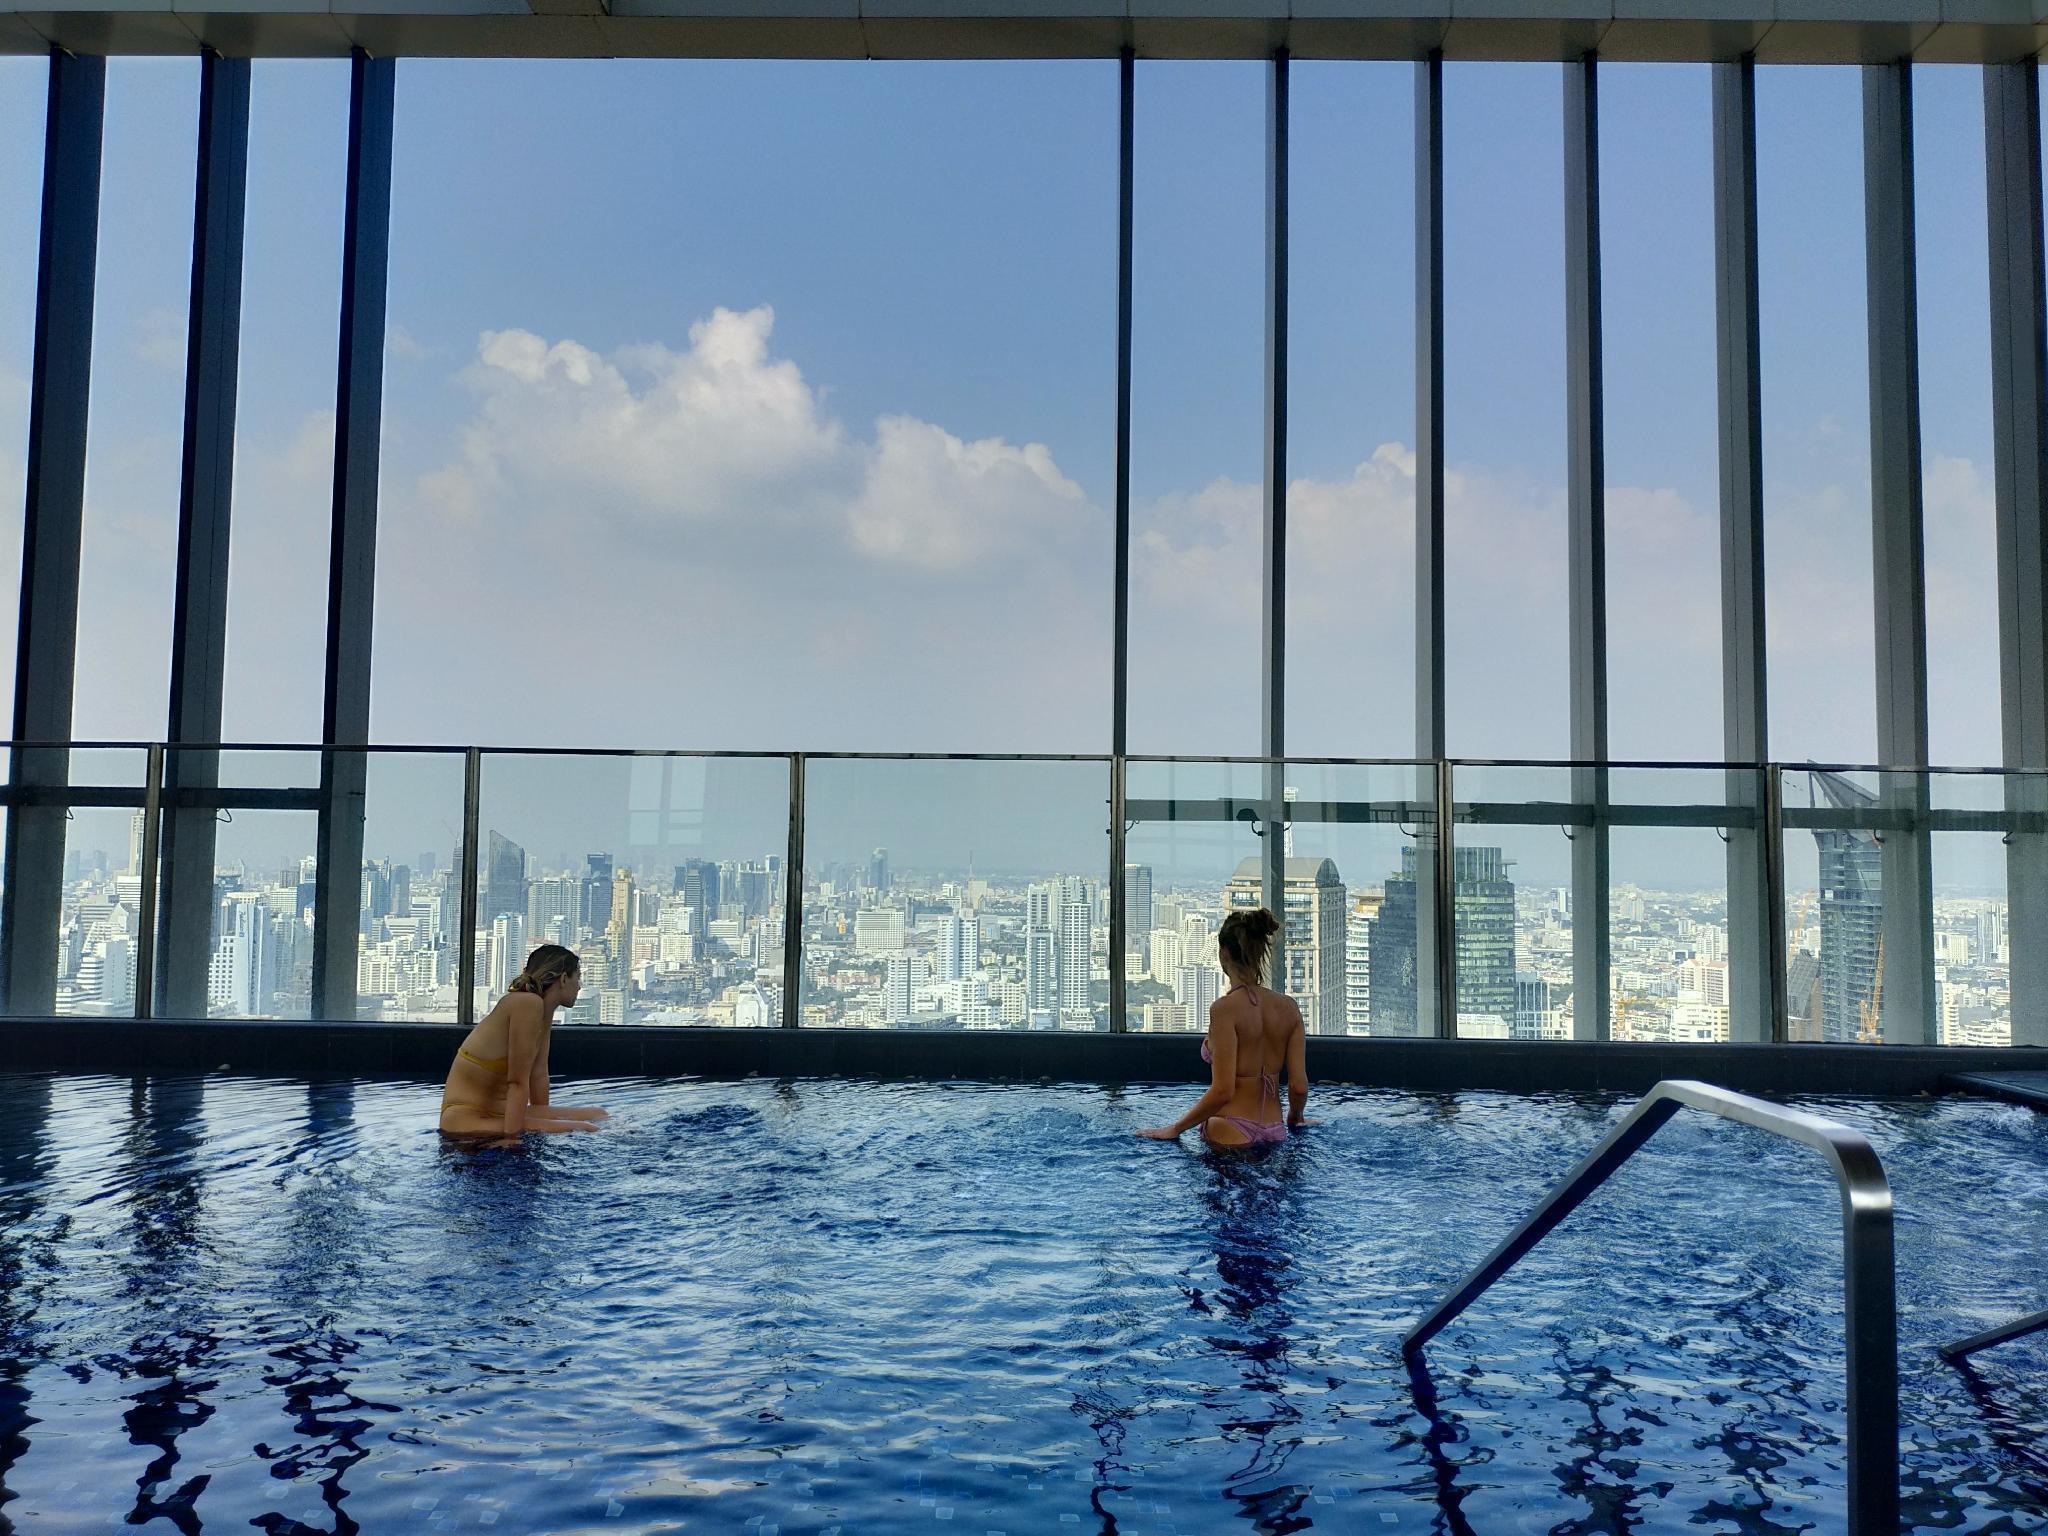 Rooftop pool luxury cozy condo free wifi 793  @BTS อพาร์ตเมนต์ 1 ห้องนอน 1 ห้องน้ำส่วนตัว ขนาด 30 ตร.ม. – สุขุมวิท